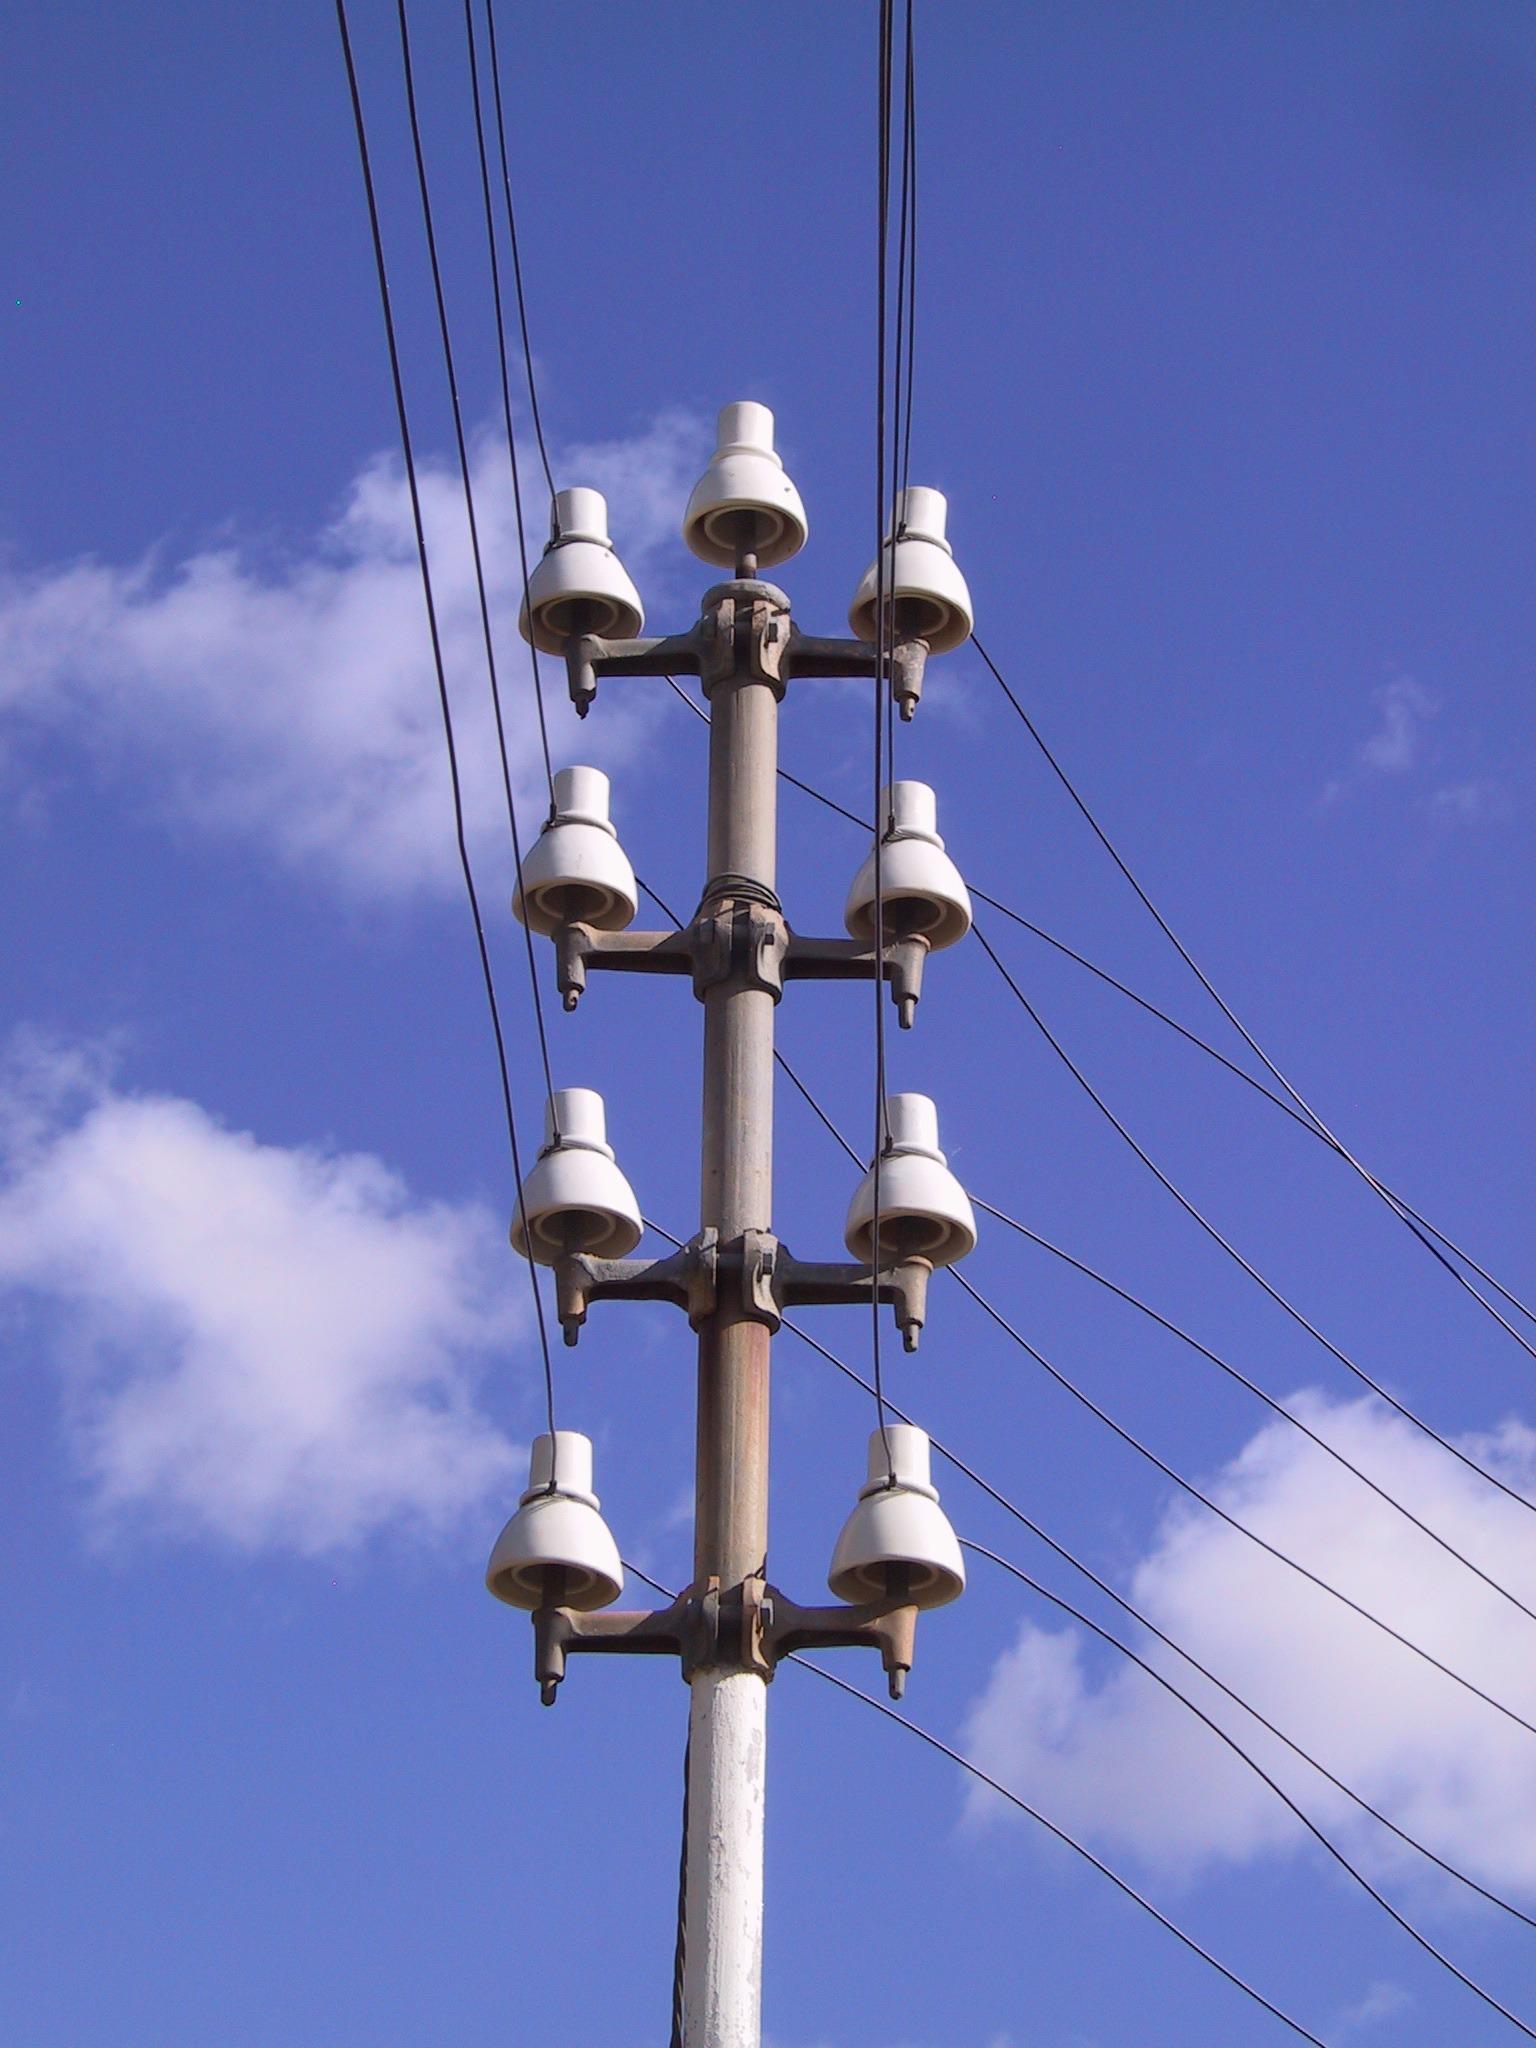 Free Images : mast, phone, communication, blue, street light